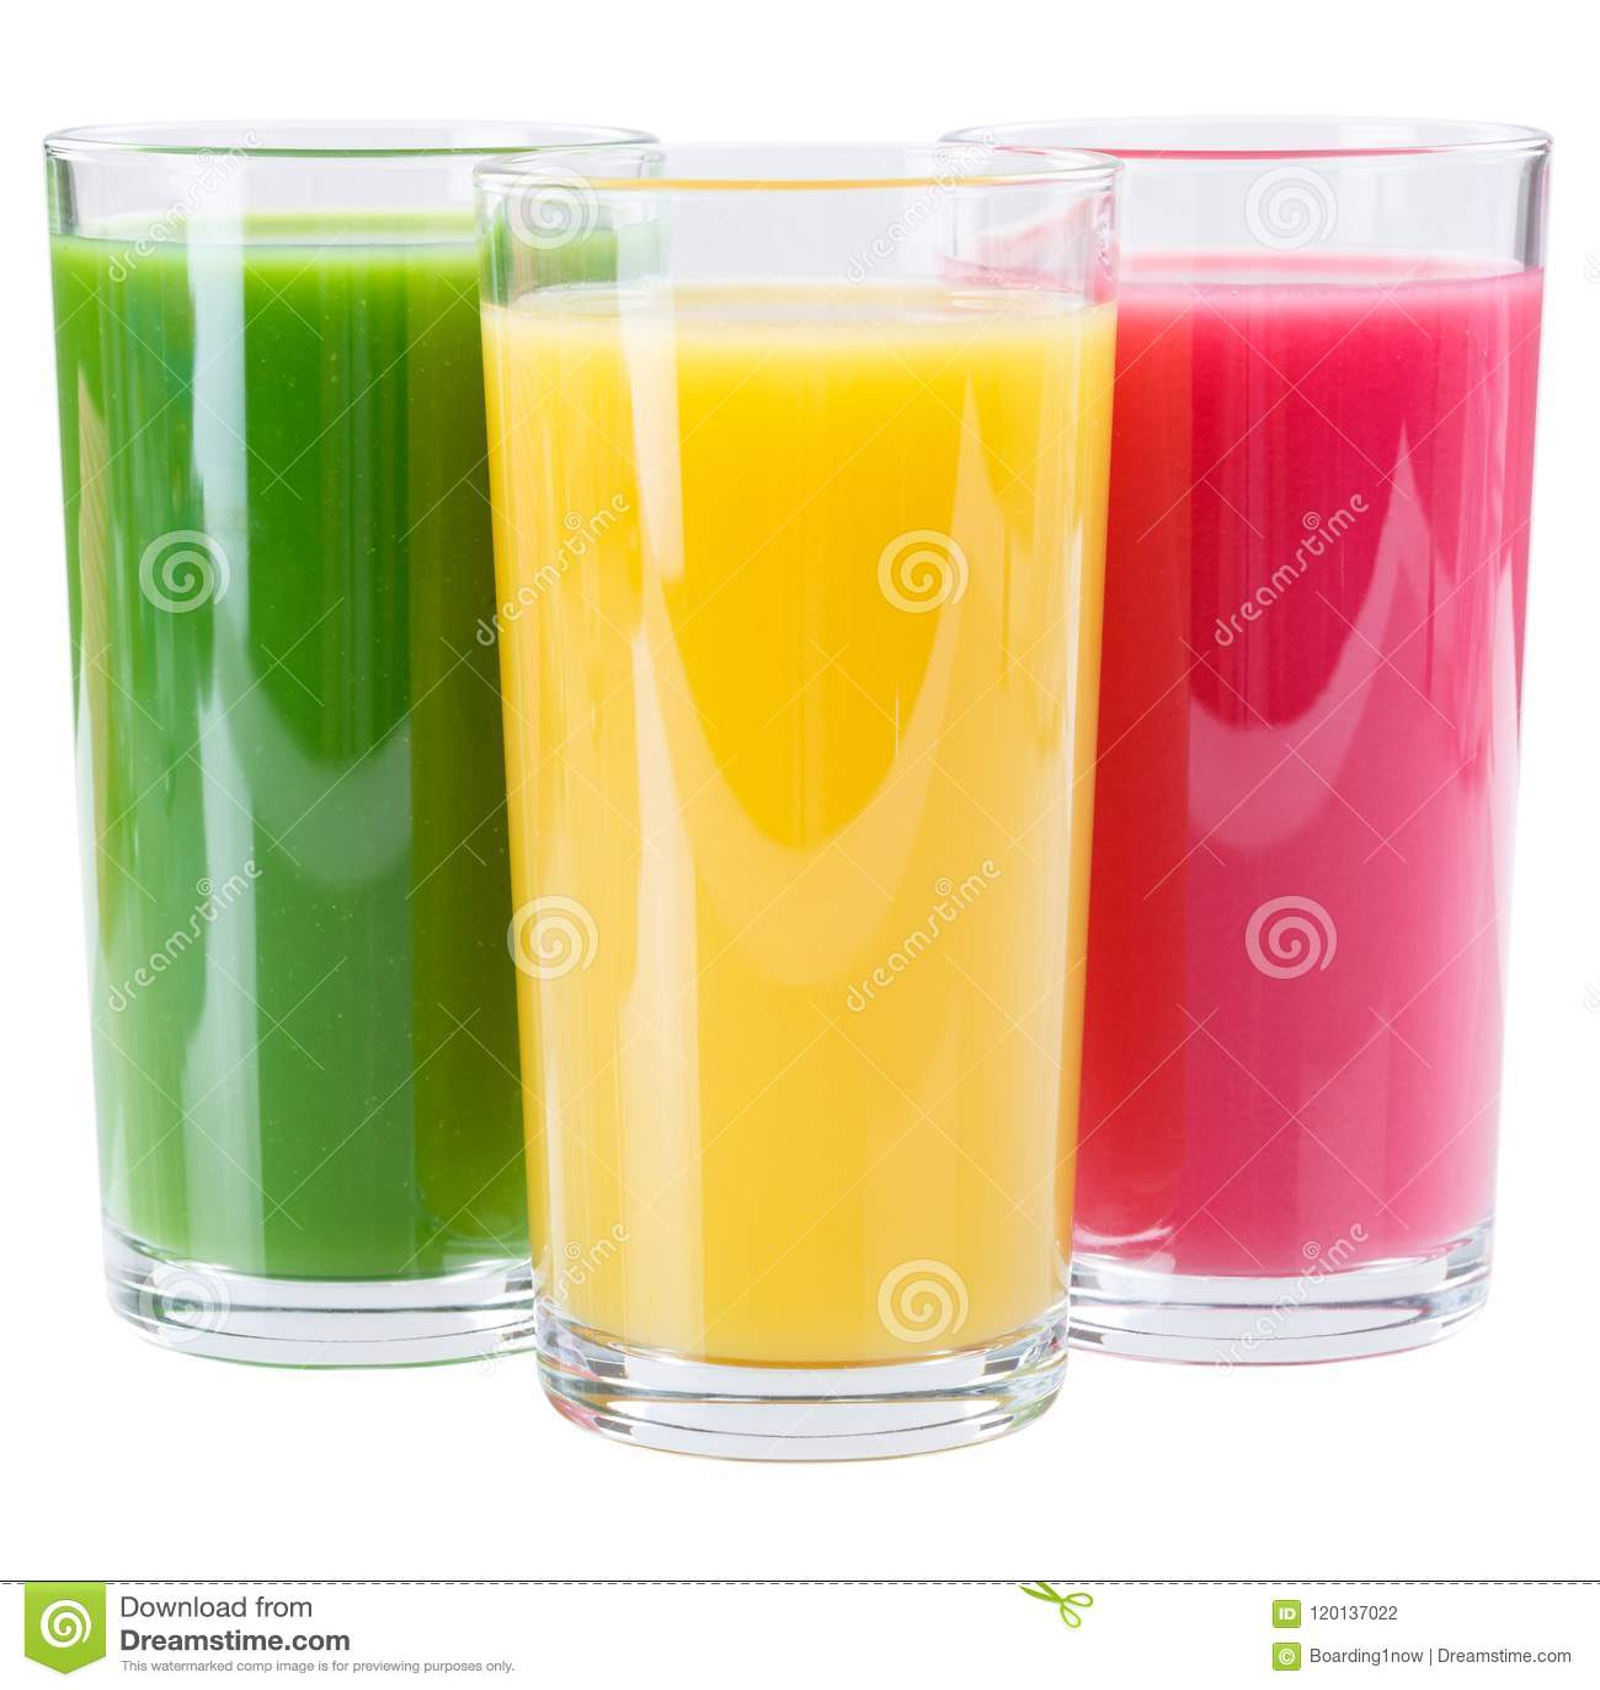 Juice smoothie smoothies isolated on white